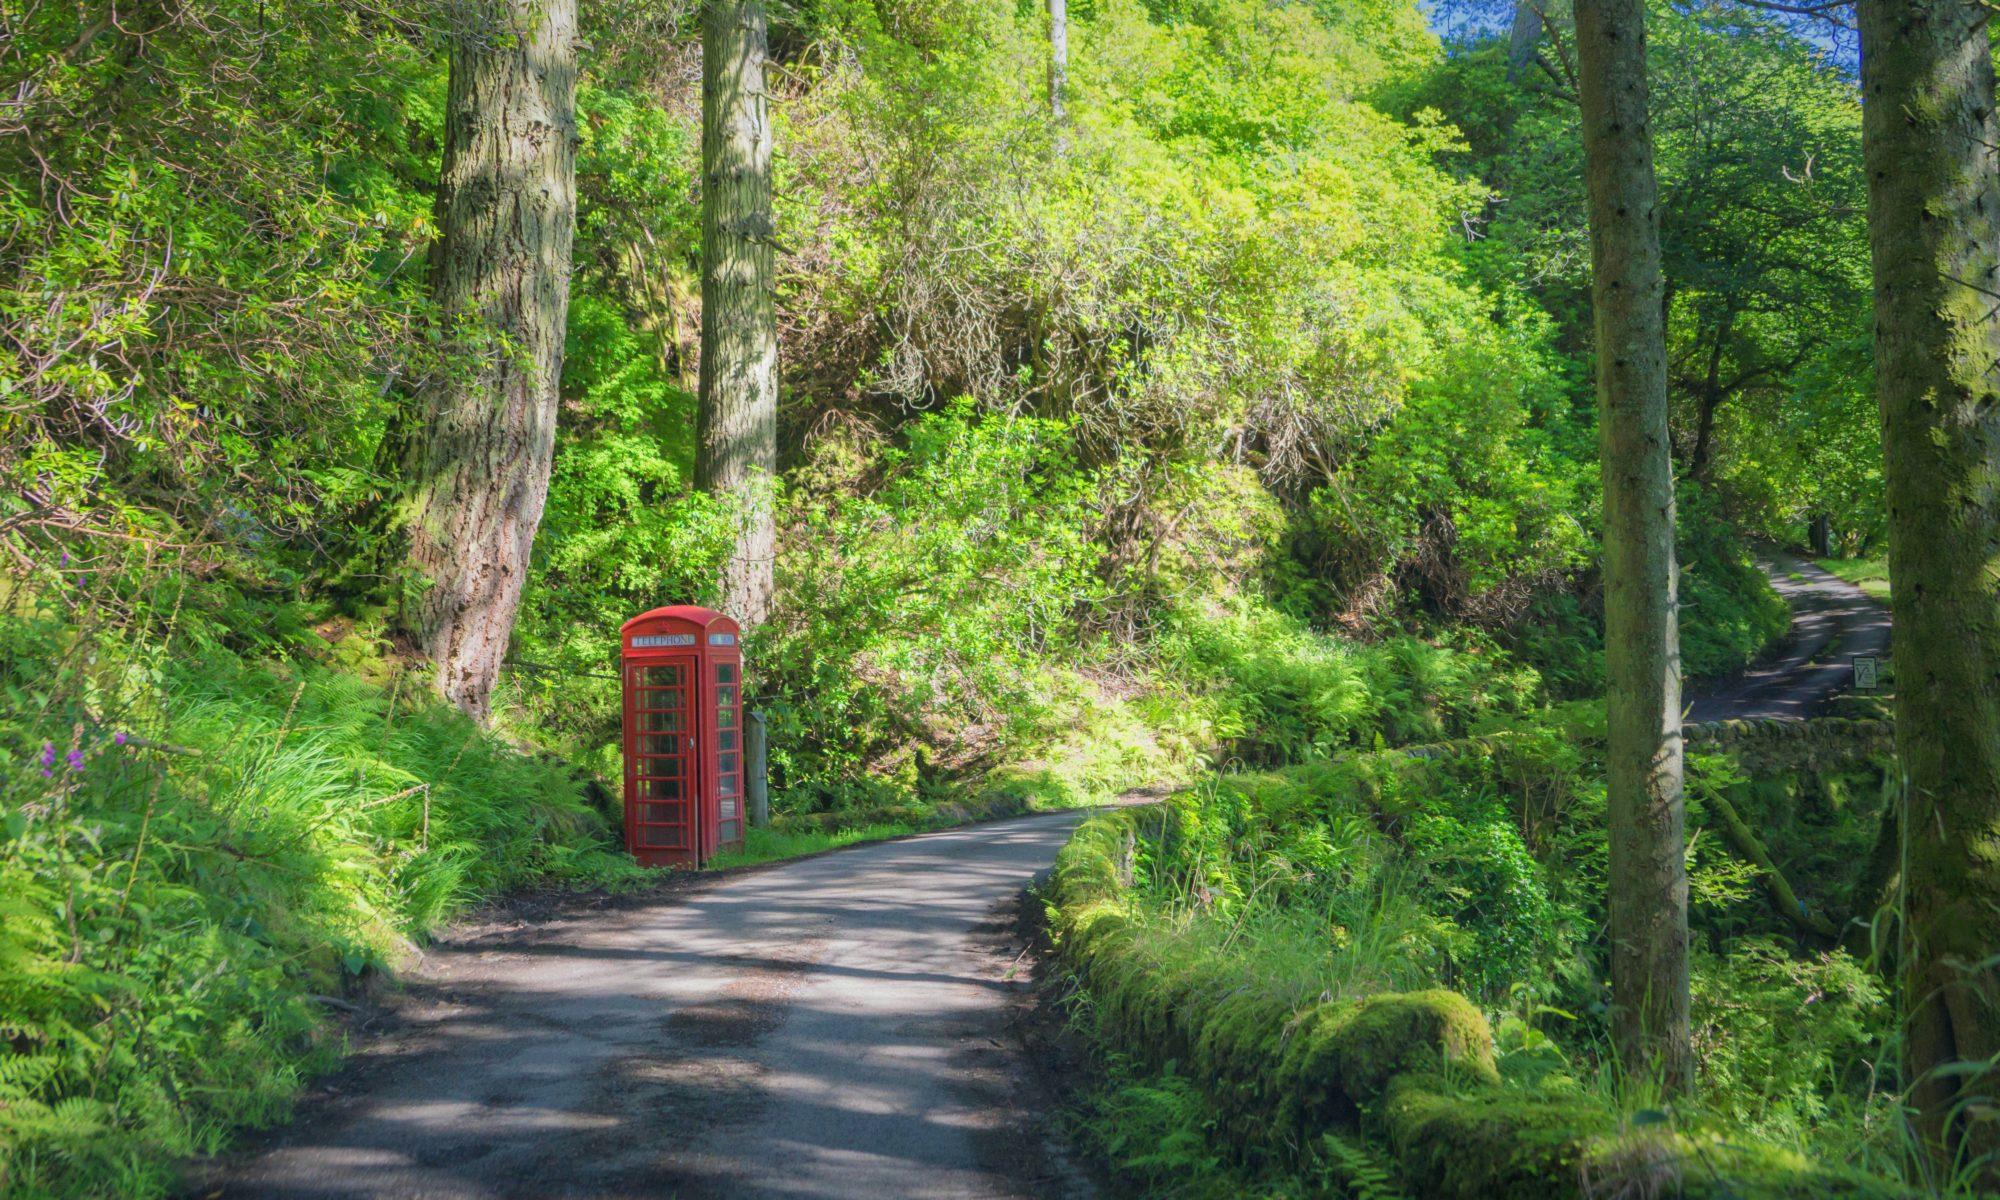 Red UK phone box on leafy country lane - suffolk copywriter - Suffolk copywriting